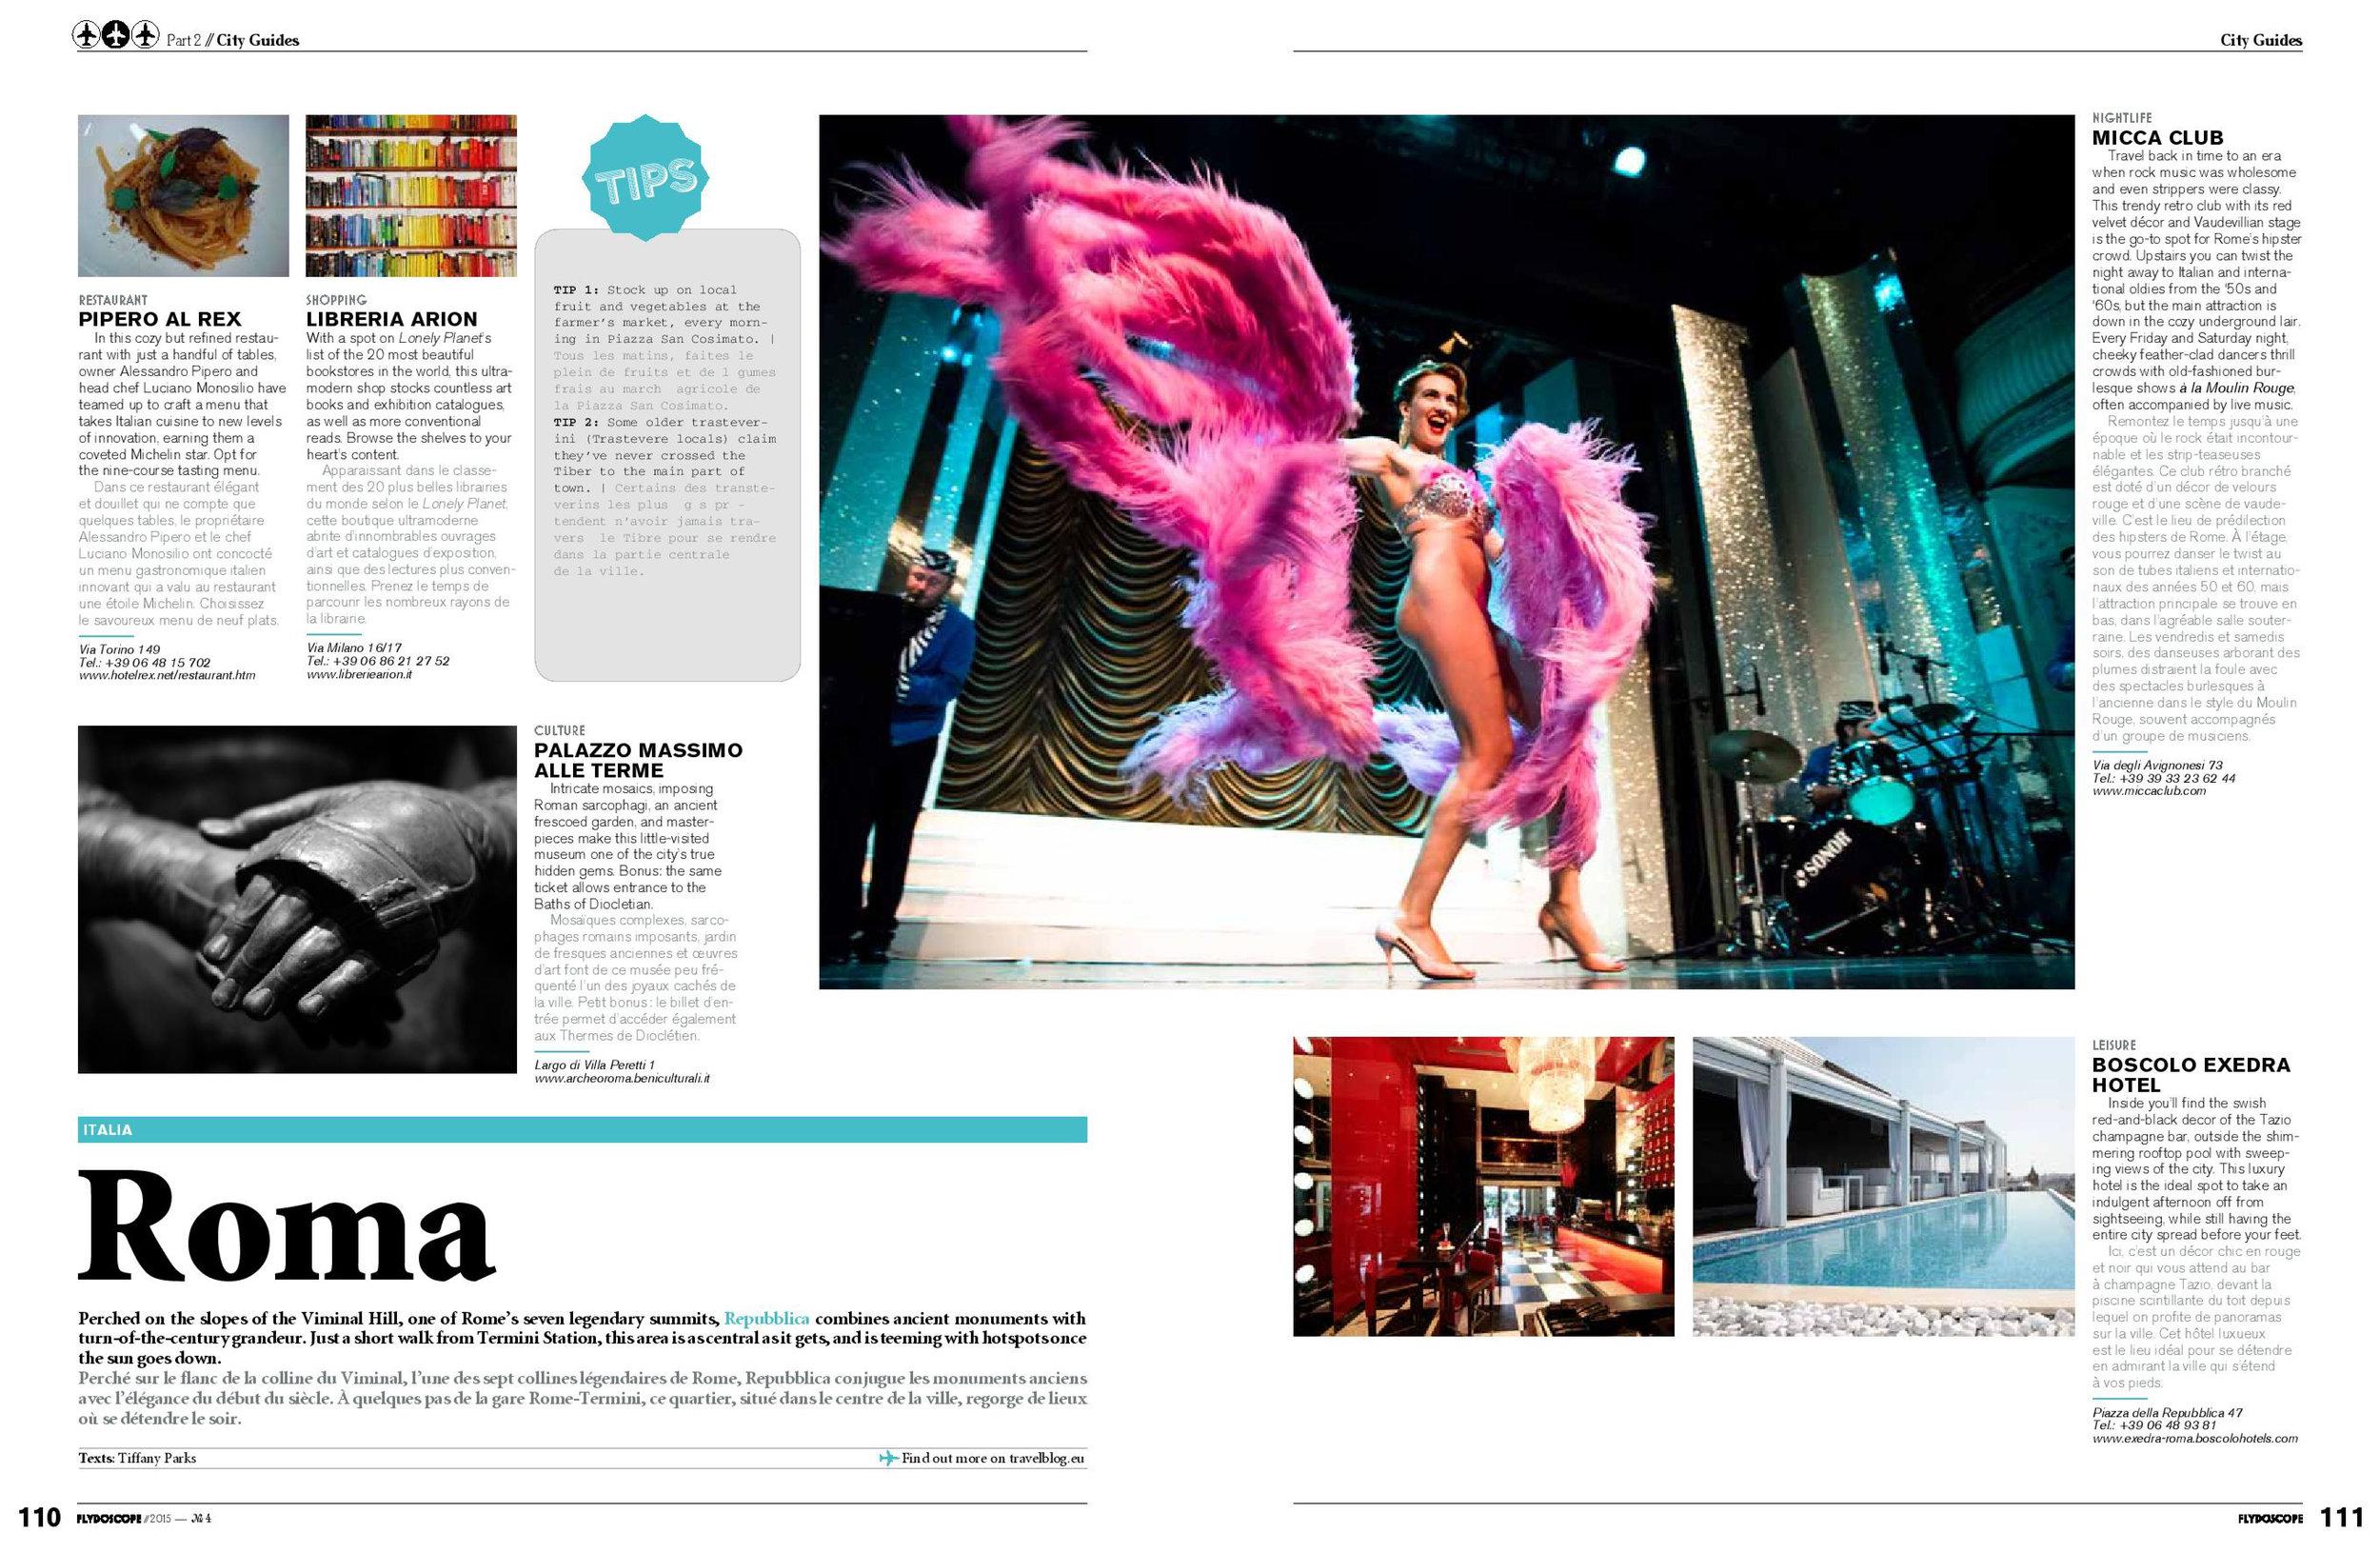 Roma-Repubblica-Flydo-2015-no4-spread.jpg